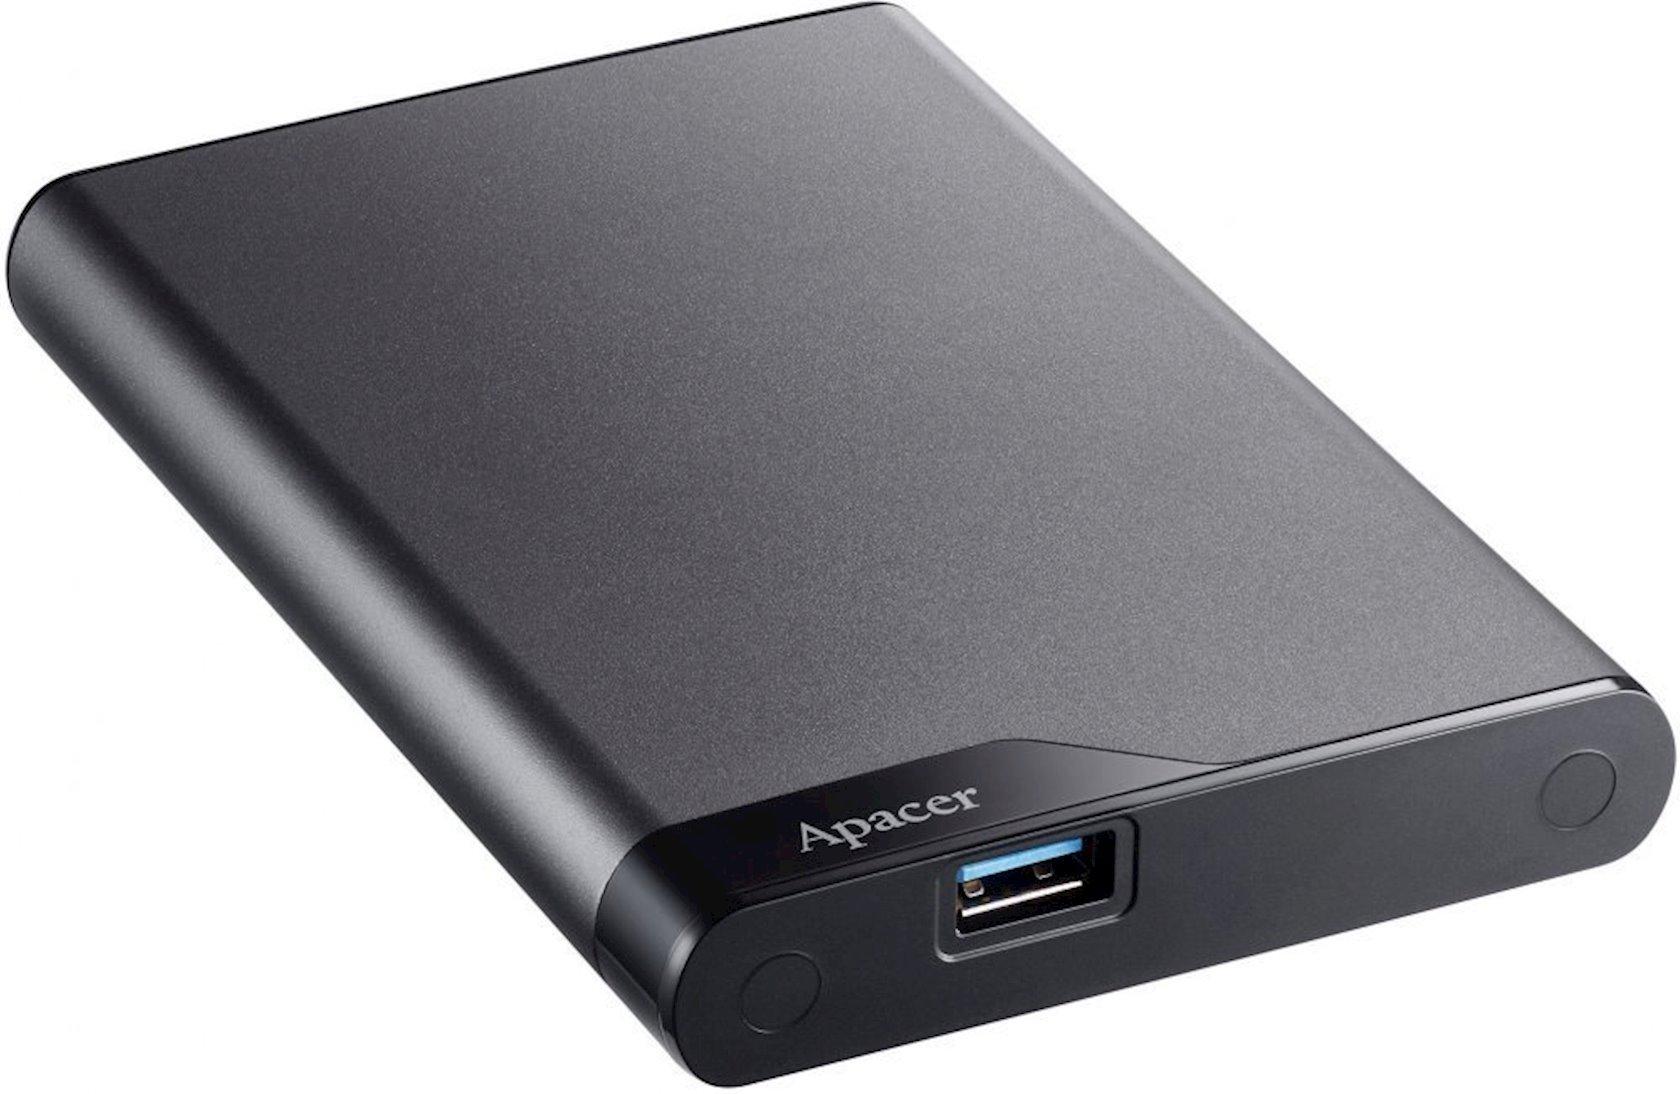 Xarici sərt disk Apacer 1 TB USB 3.1 Gen 1 Portable Hard Drive AC632 Gray Shockproof